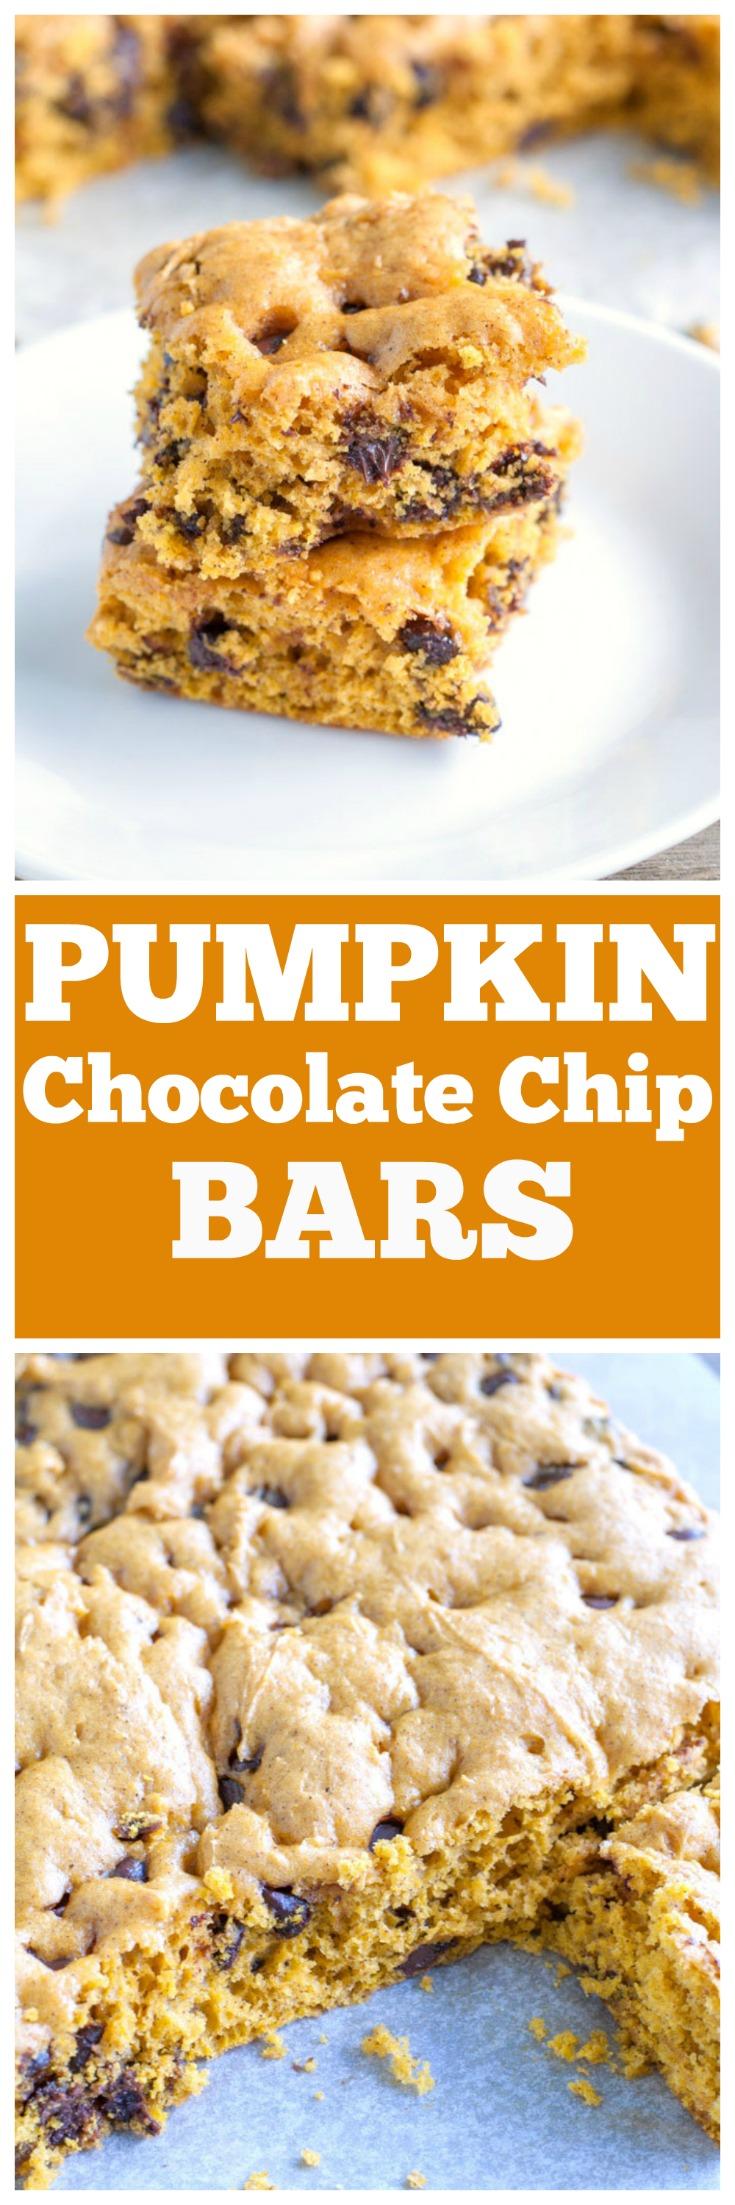 Pumpkin Chocolate Chip Bars PIN